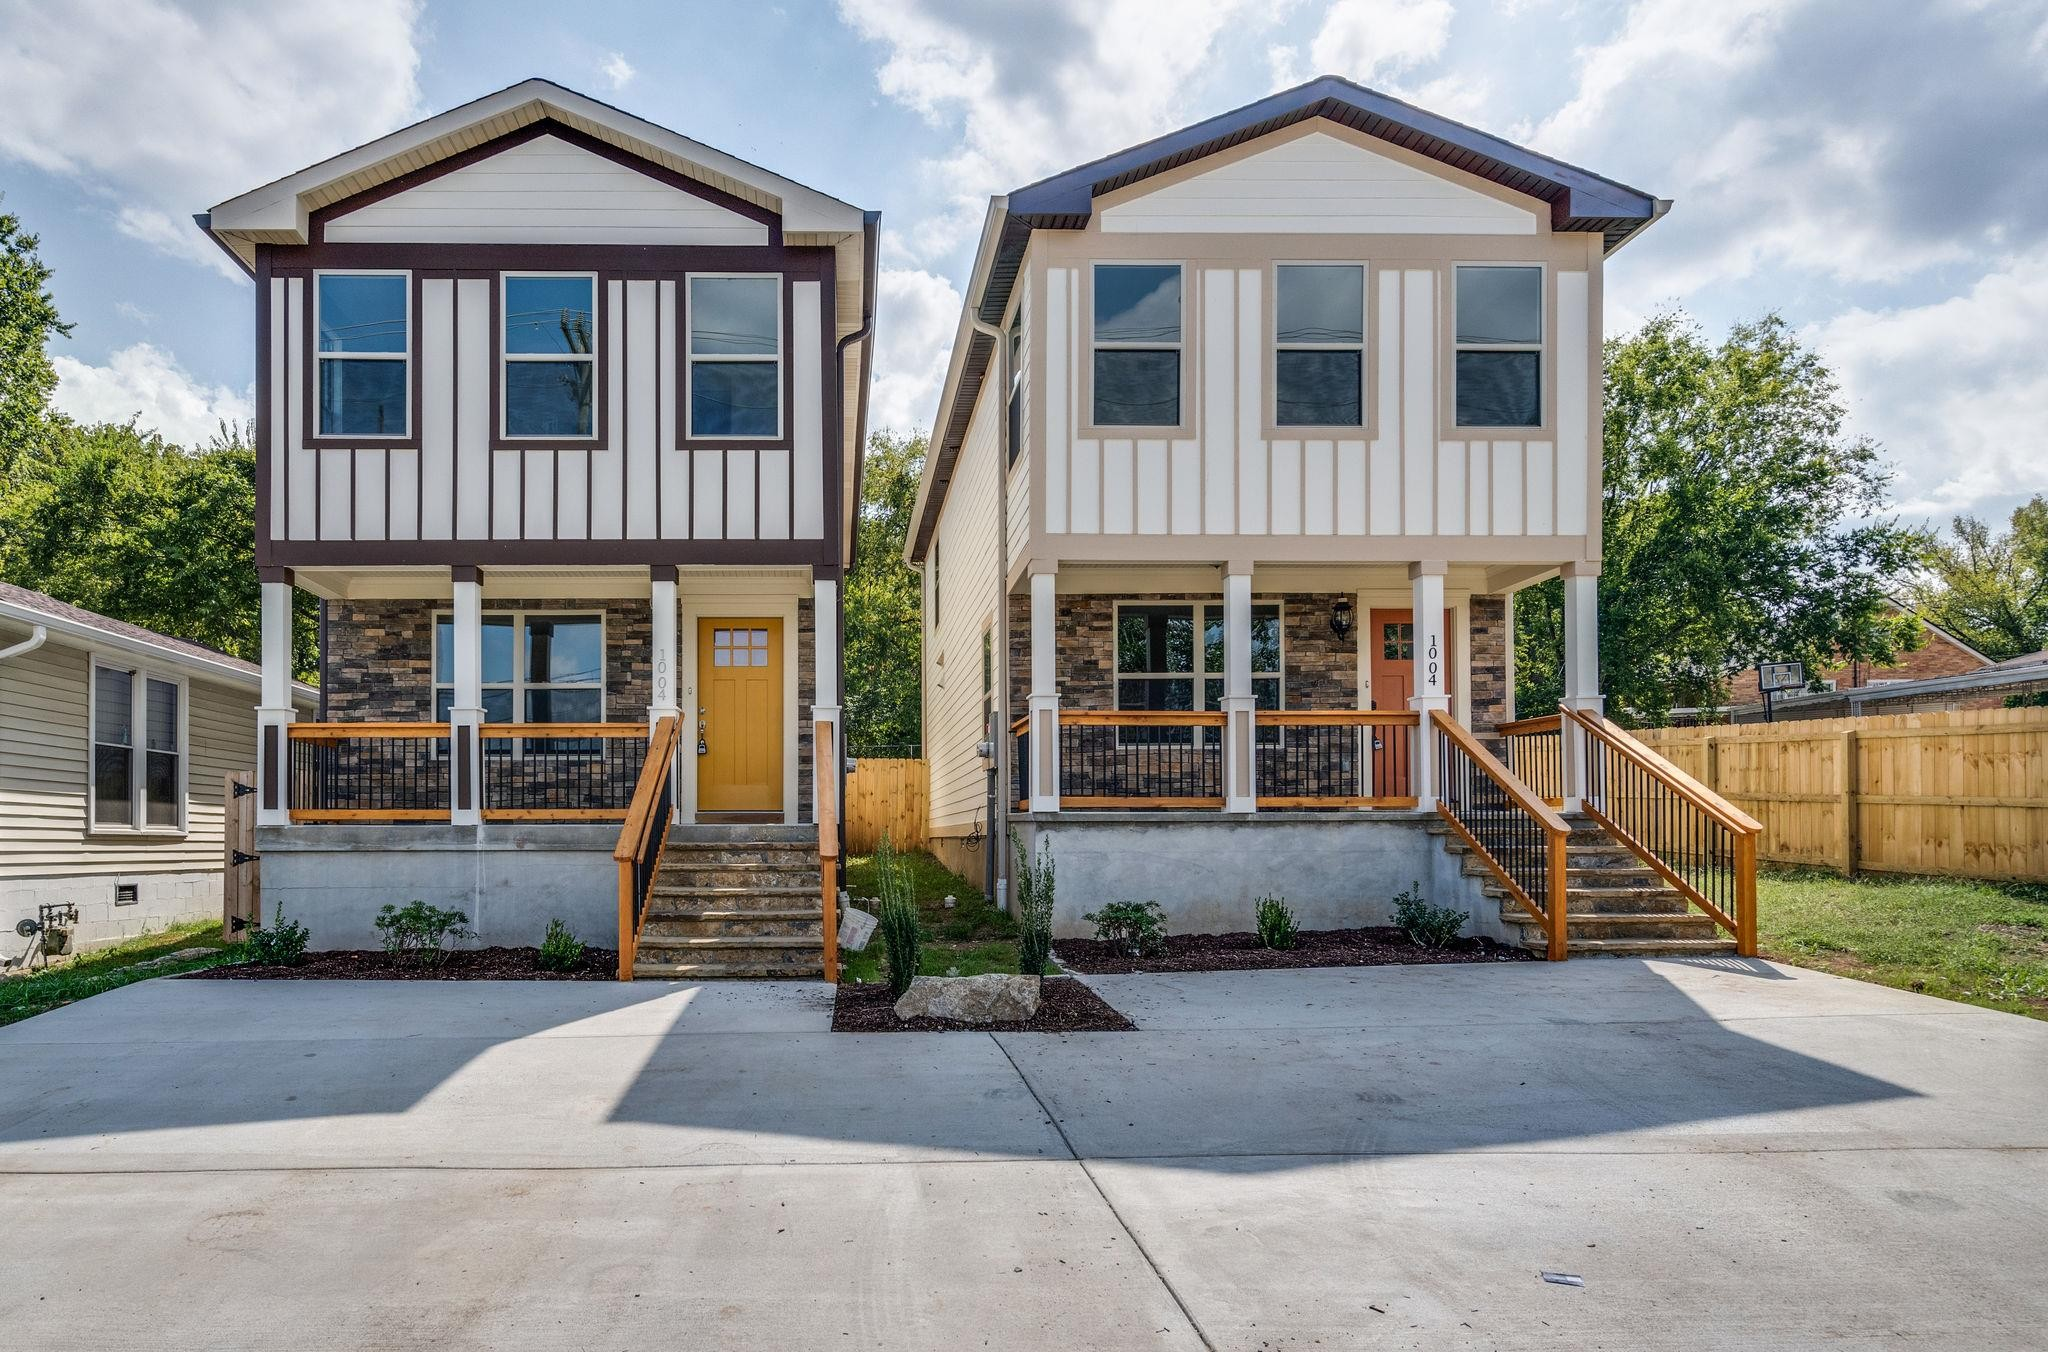 1004B E Old Hickory Blvd, Madison, TN 37115 - Madison, TN real estate listing